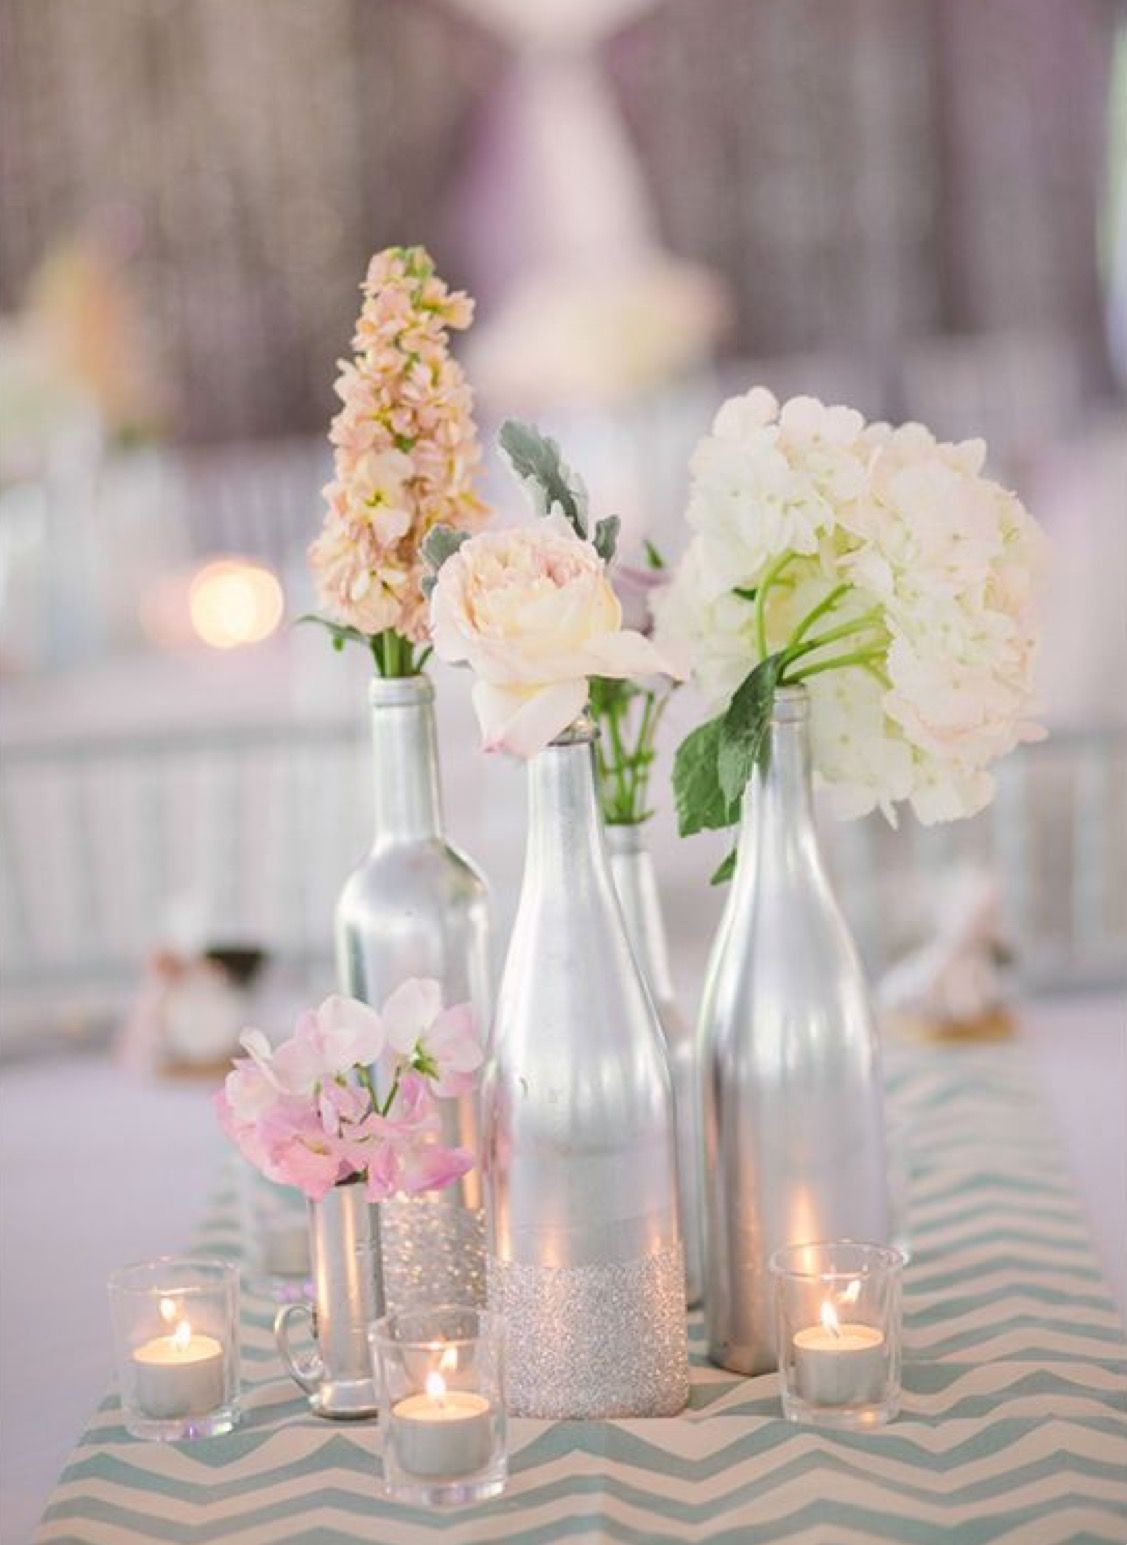 Pin by Iggy C on Wedding diy ideas | Pinterest | Centrepieces ...